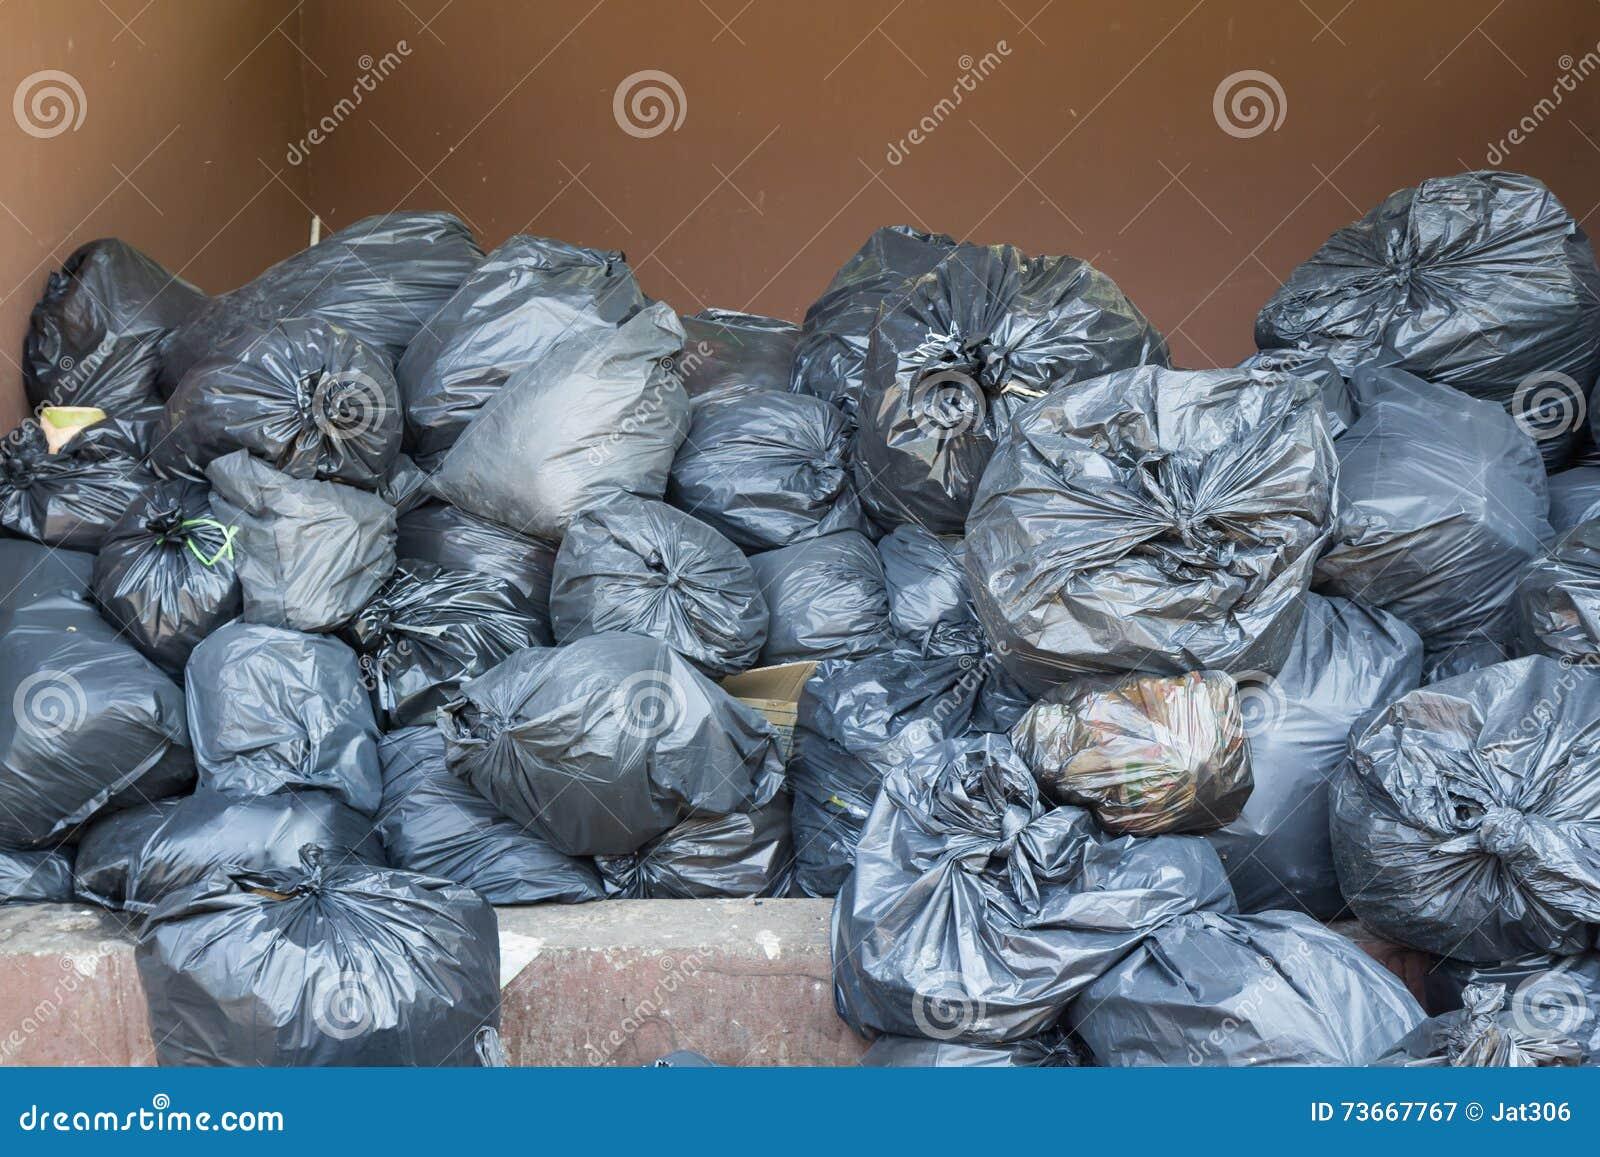 Black Trash Bags Pile Stock Photo - Image: 73667767